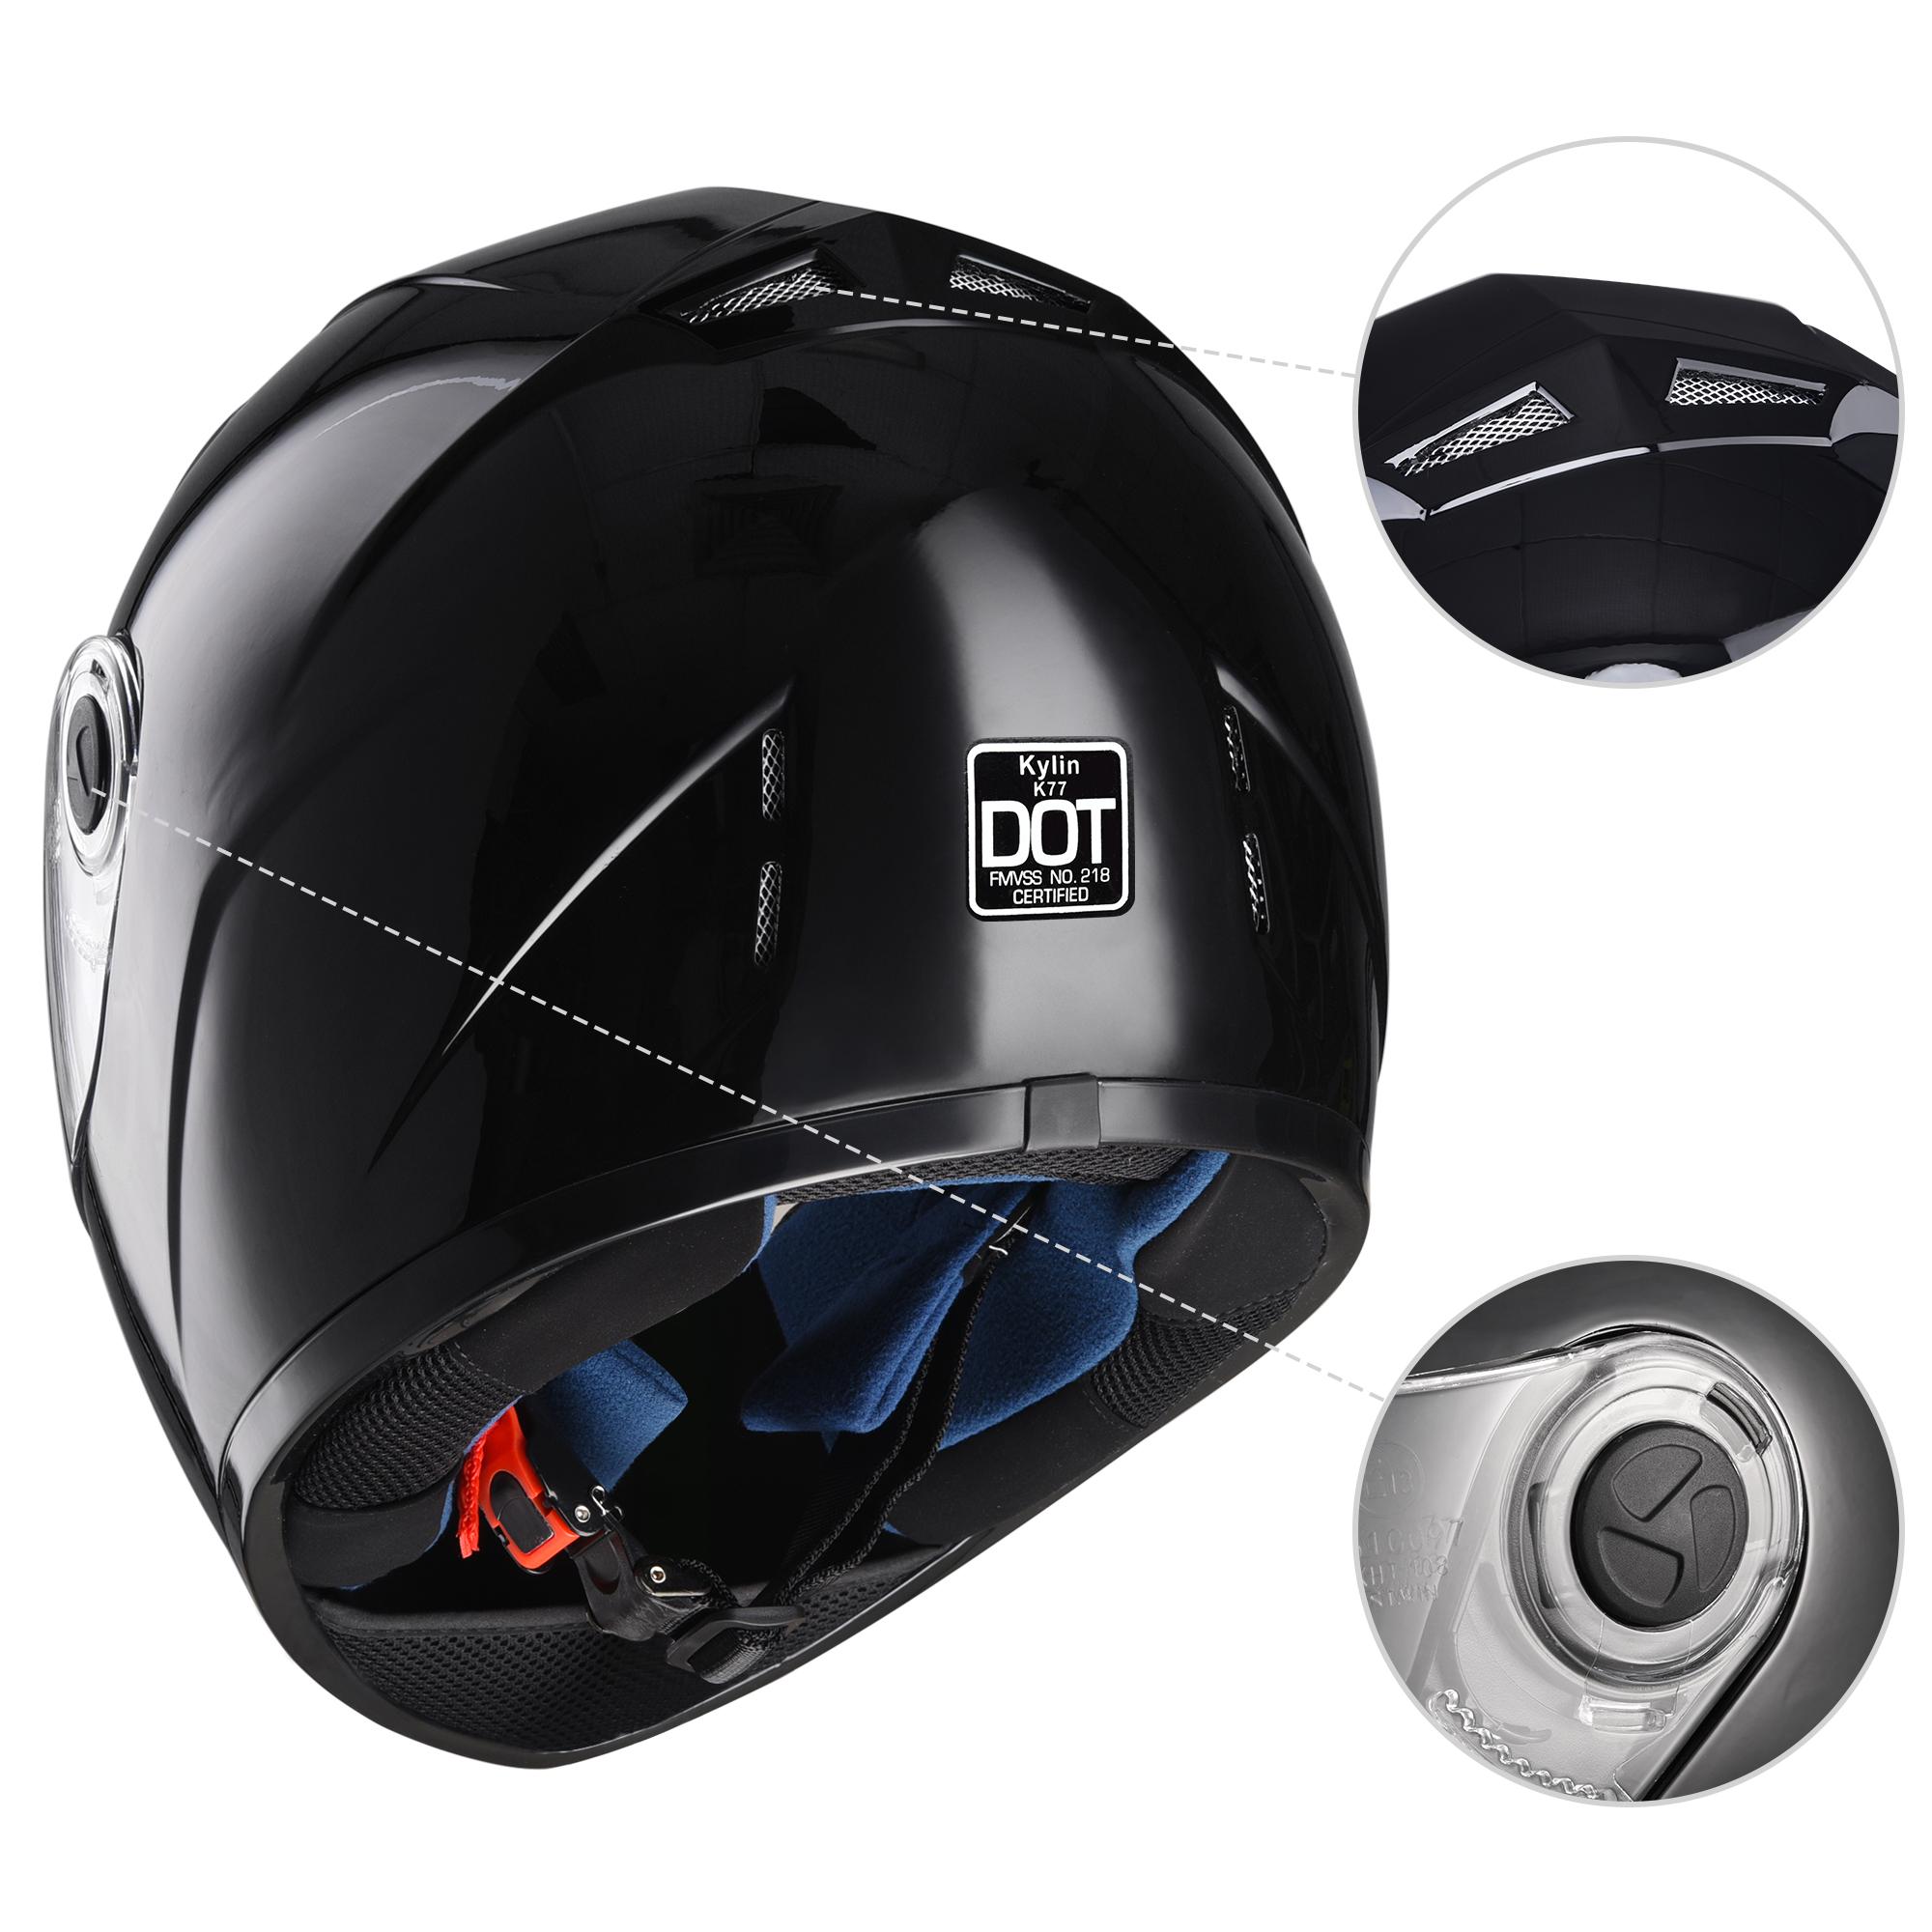 miniature 124 - AHR K12 Full Face Motorcycle Helmet DOT Air Vents Clear Visor Racing S M L XL